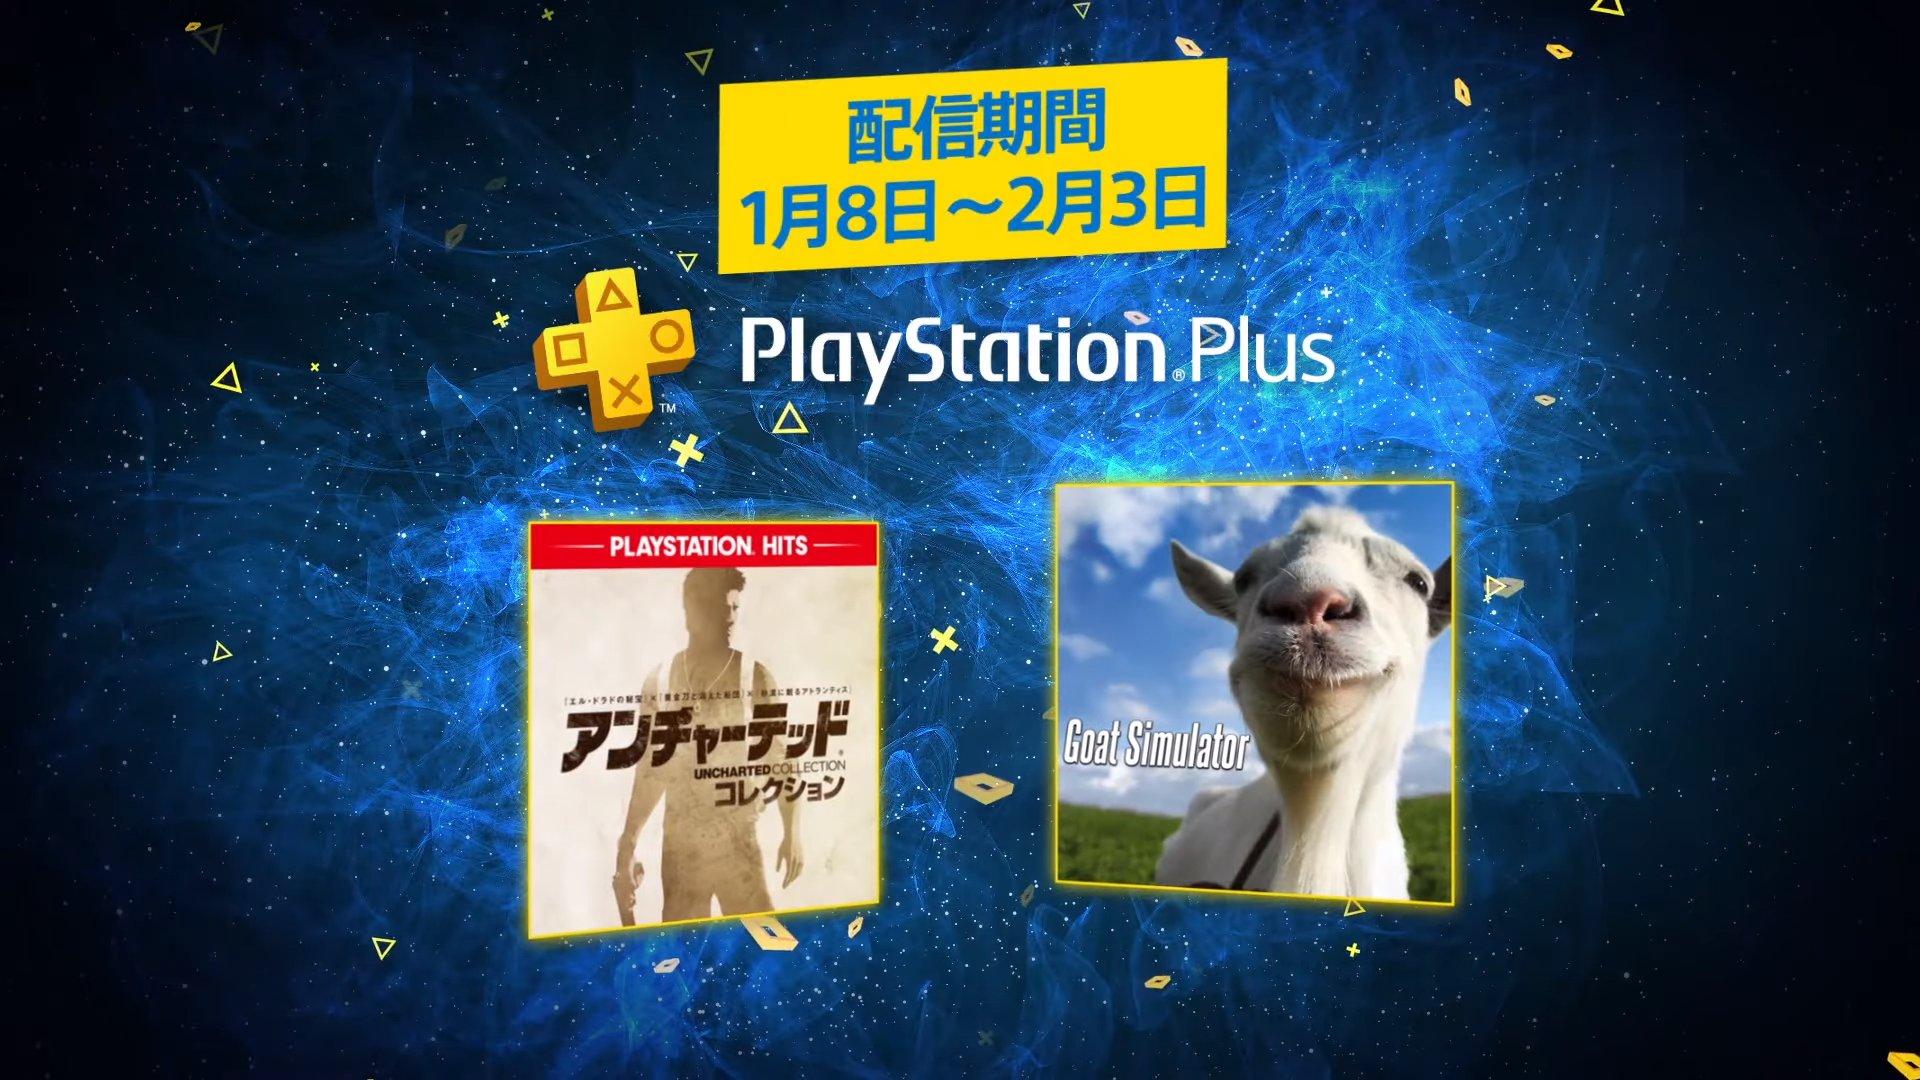 【PS4】2020年1月のフリプ、アンチャコレクションとゴートシミュレーターwwwww